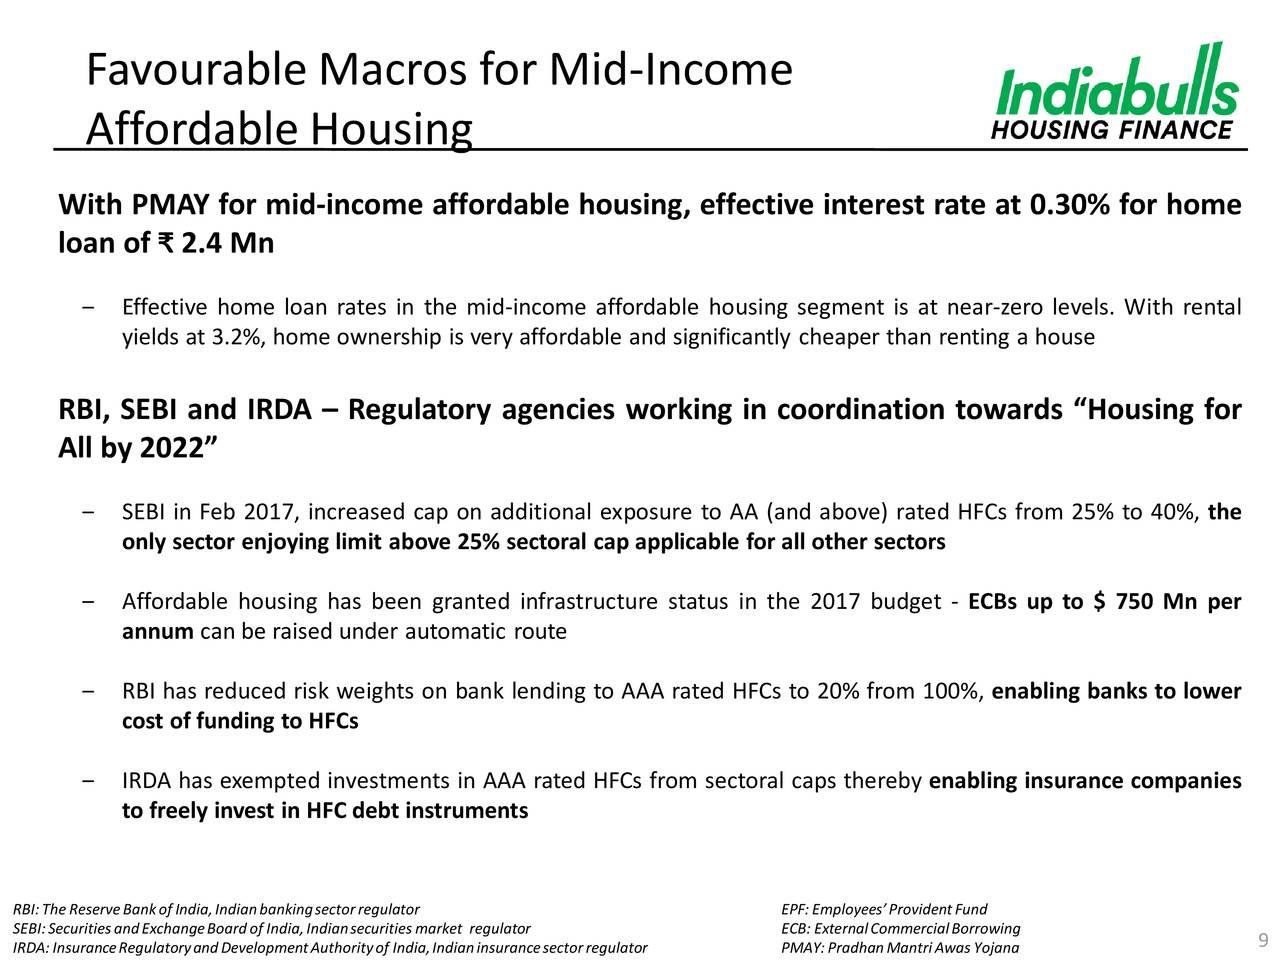 Indiabulls Housing Finance (IDKQY) Macro Updates on Mid ...